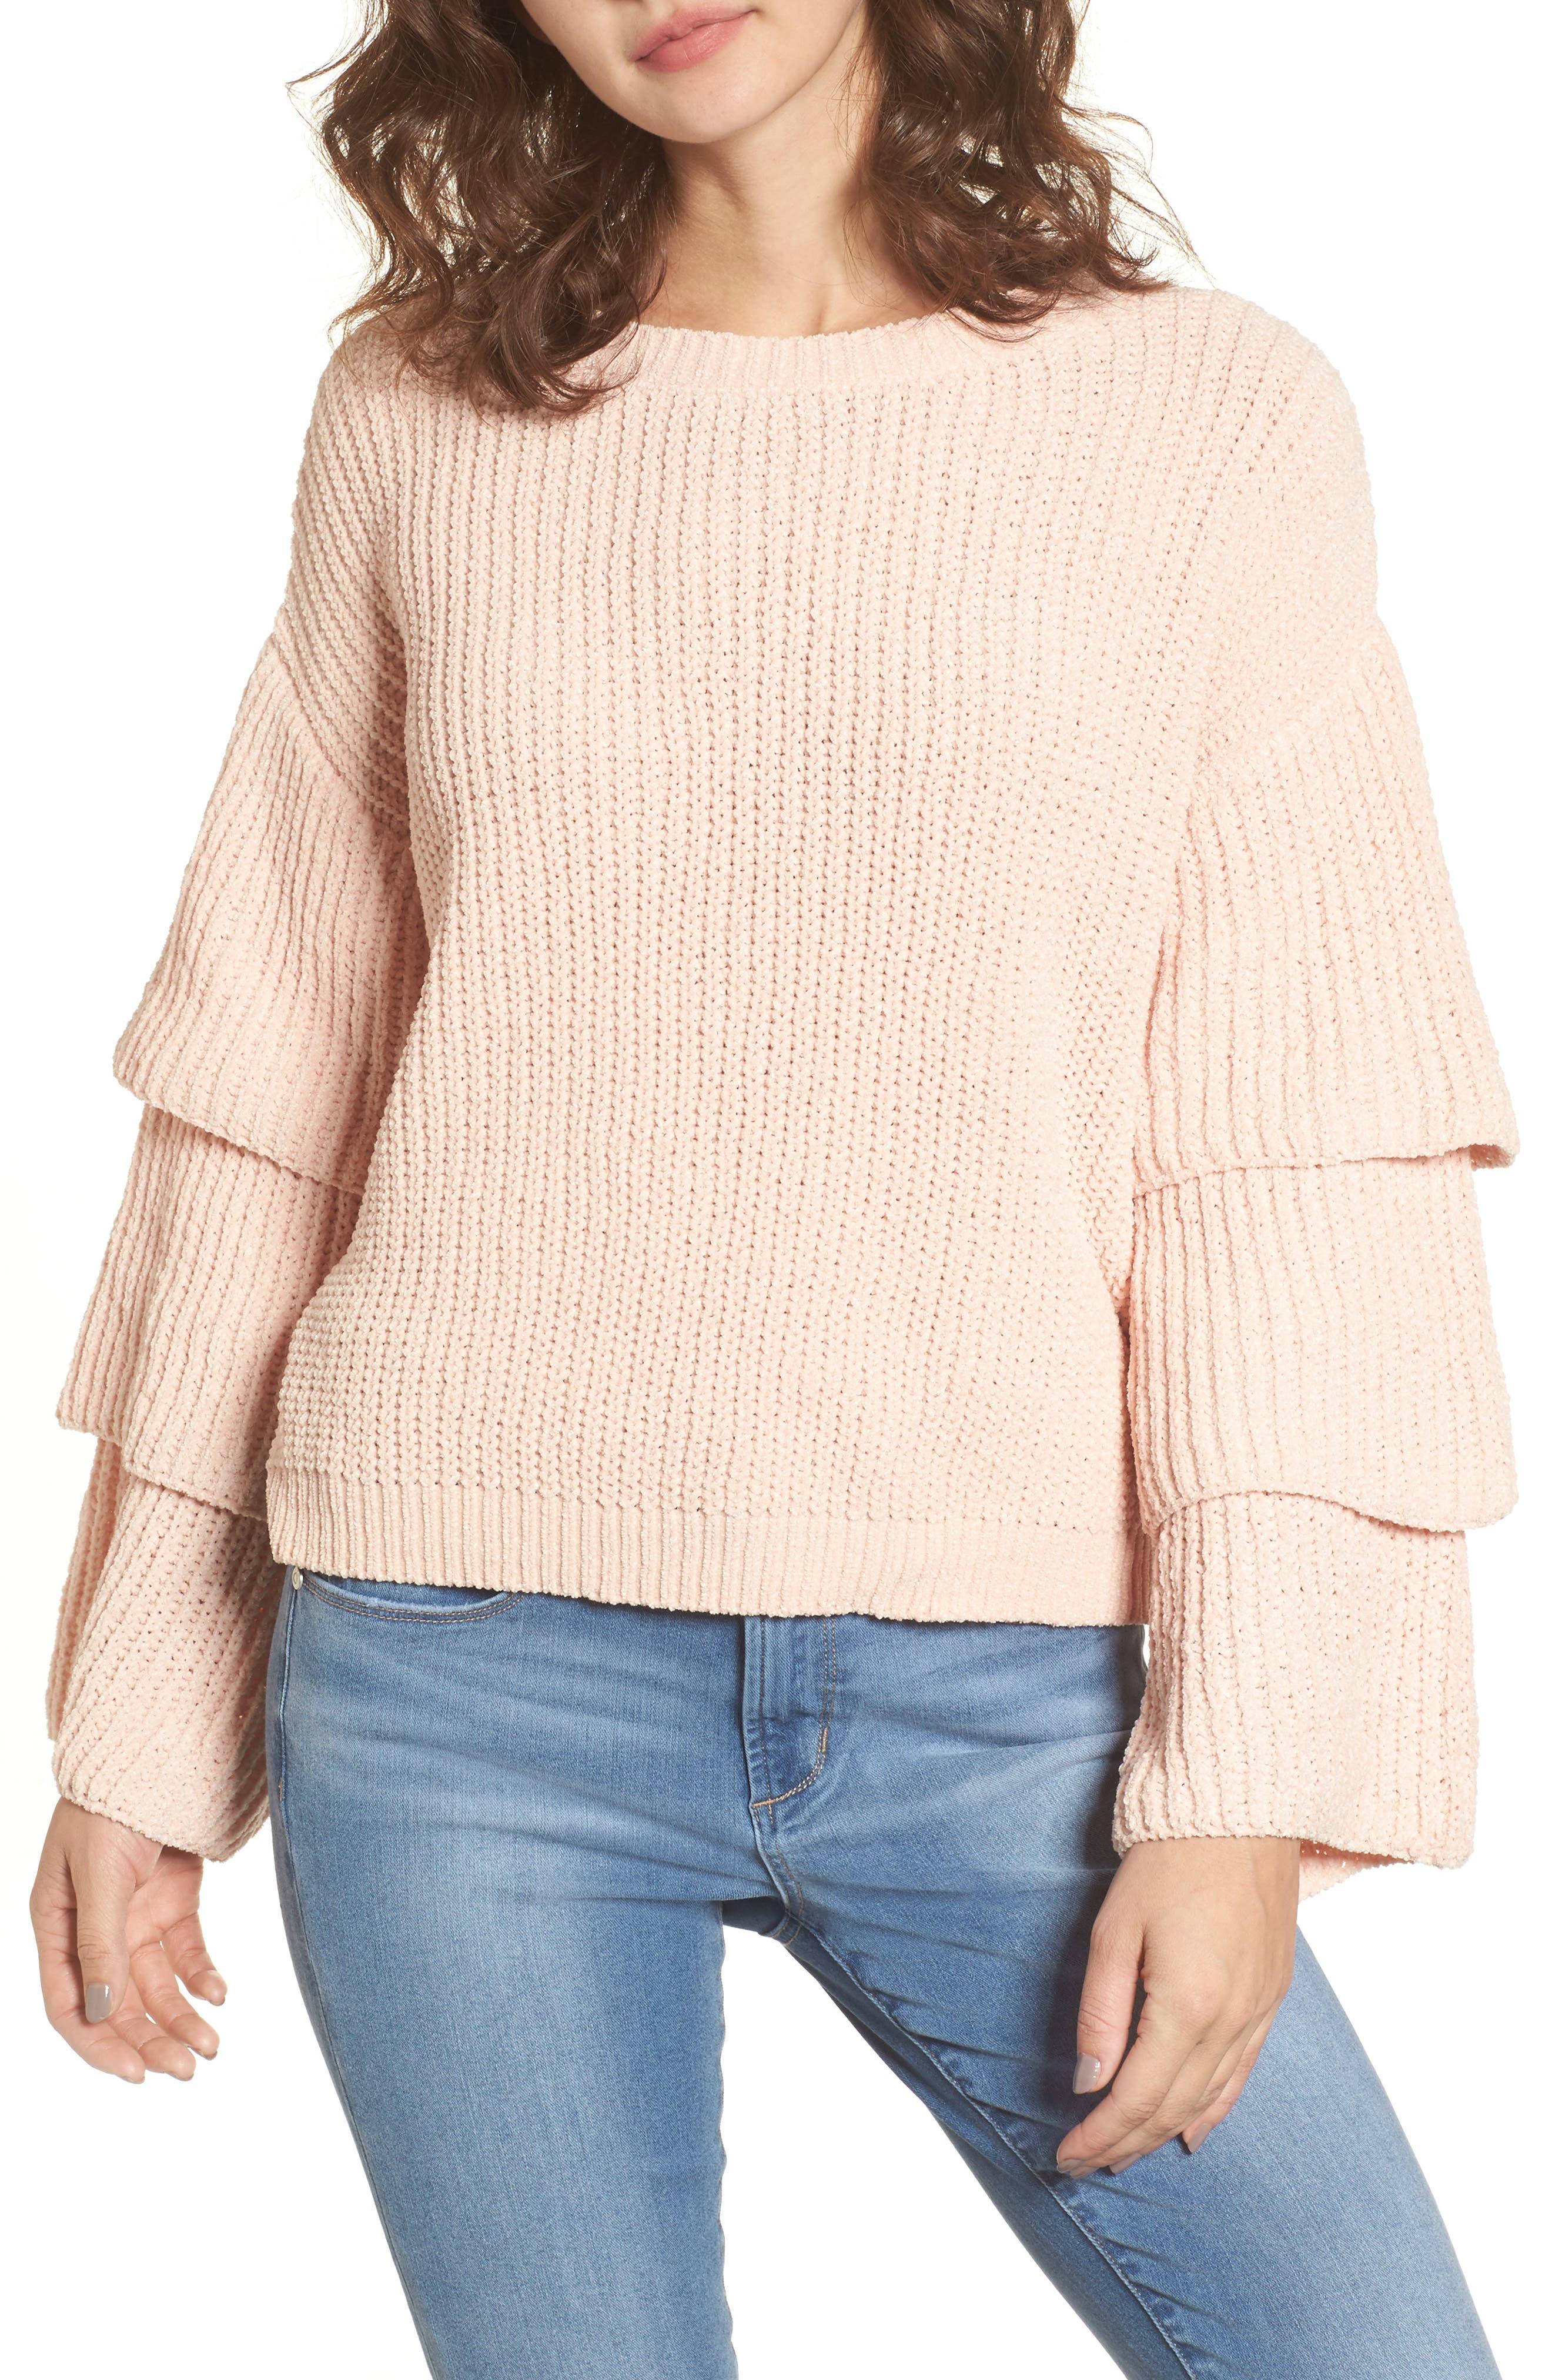 Main Image - Woven Heart Triple Ruffle Sweater